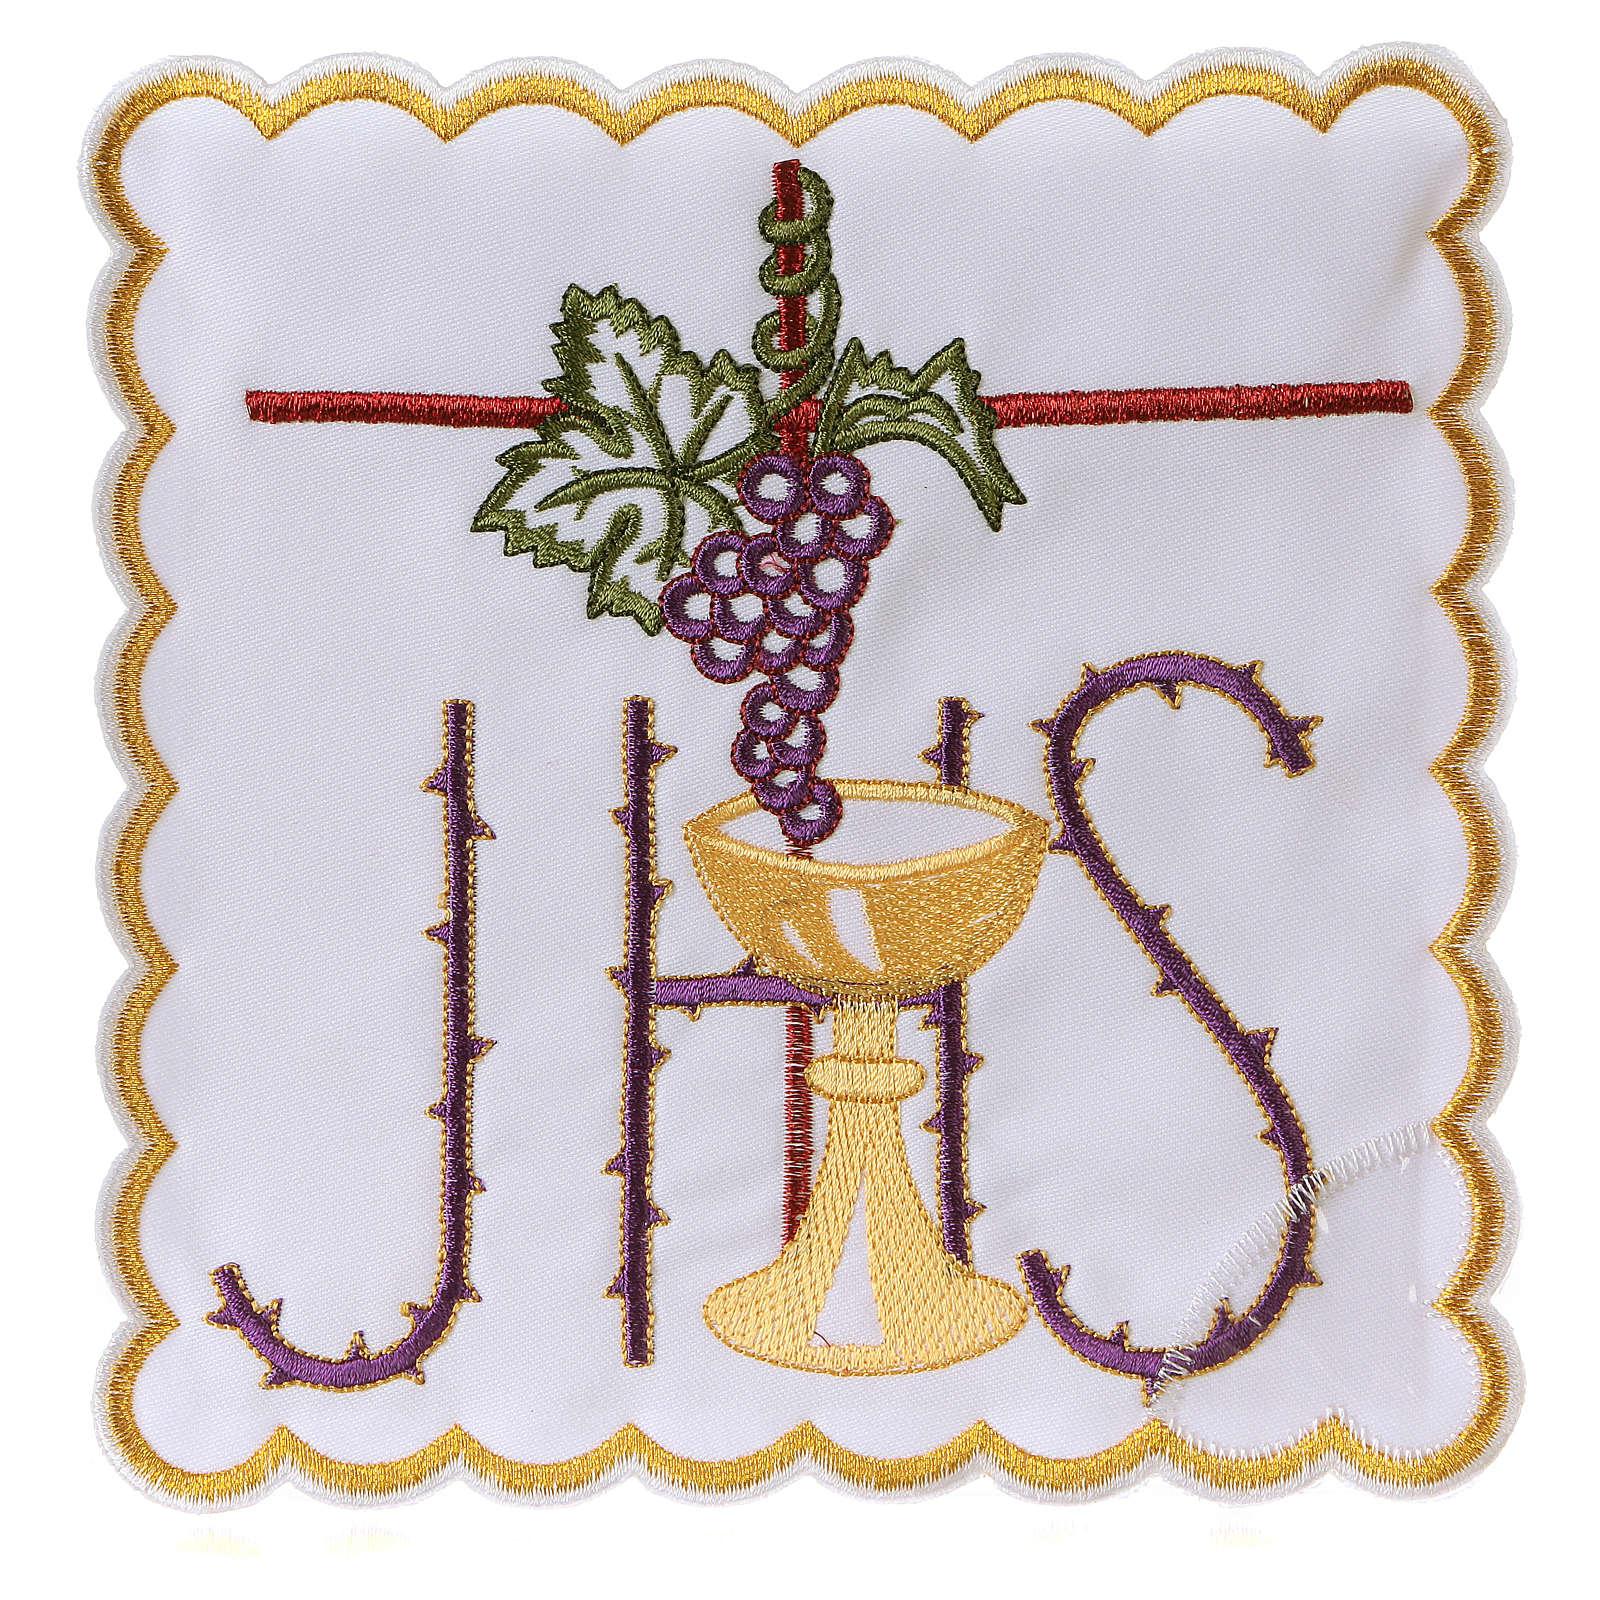 Altar linen chalice vine leaves spiked JHS symbol, cotton 4